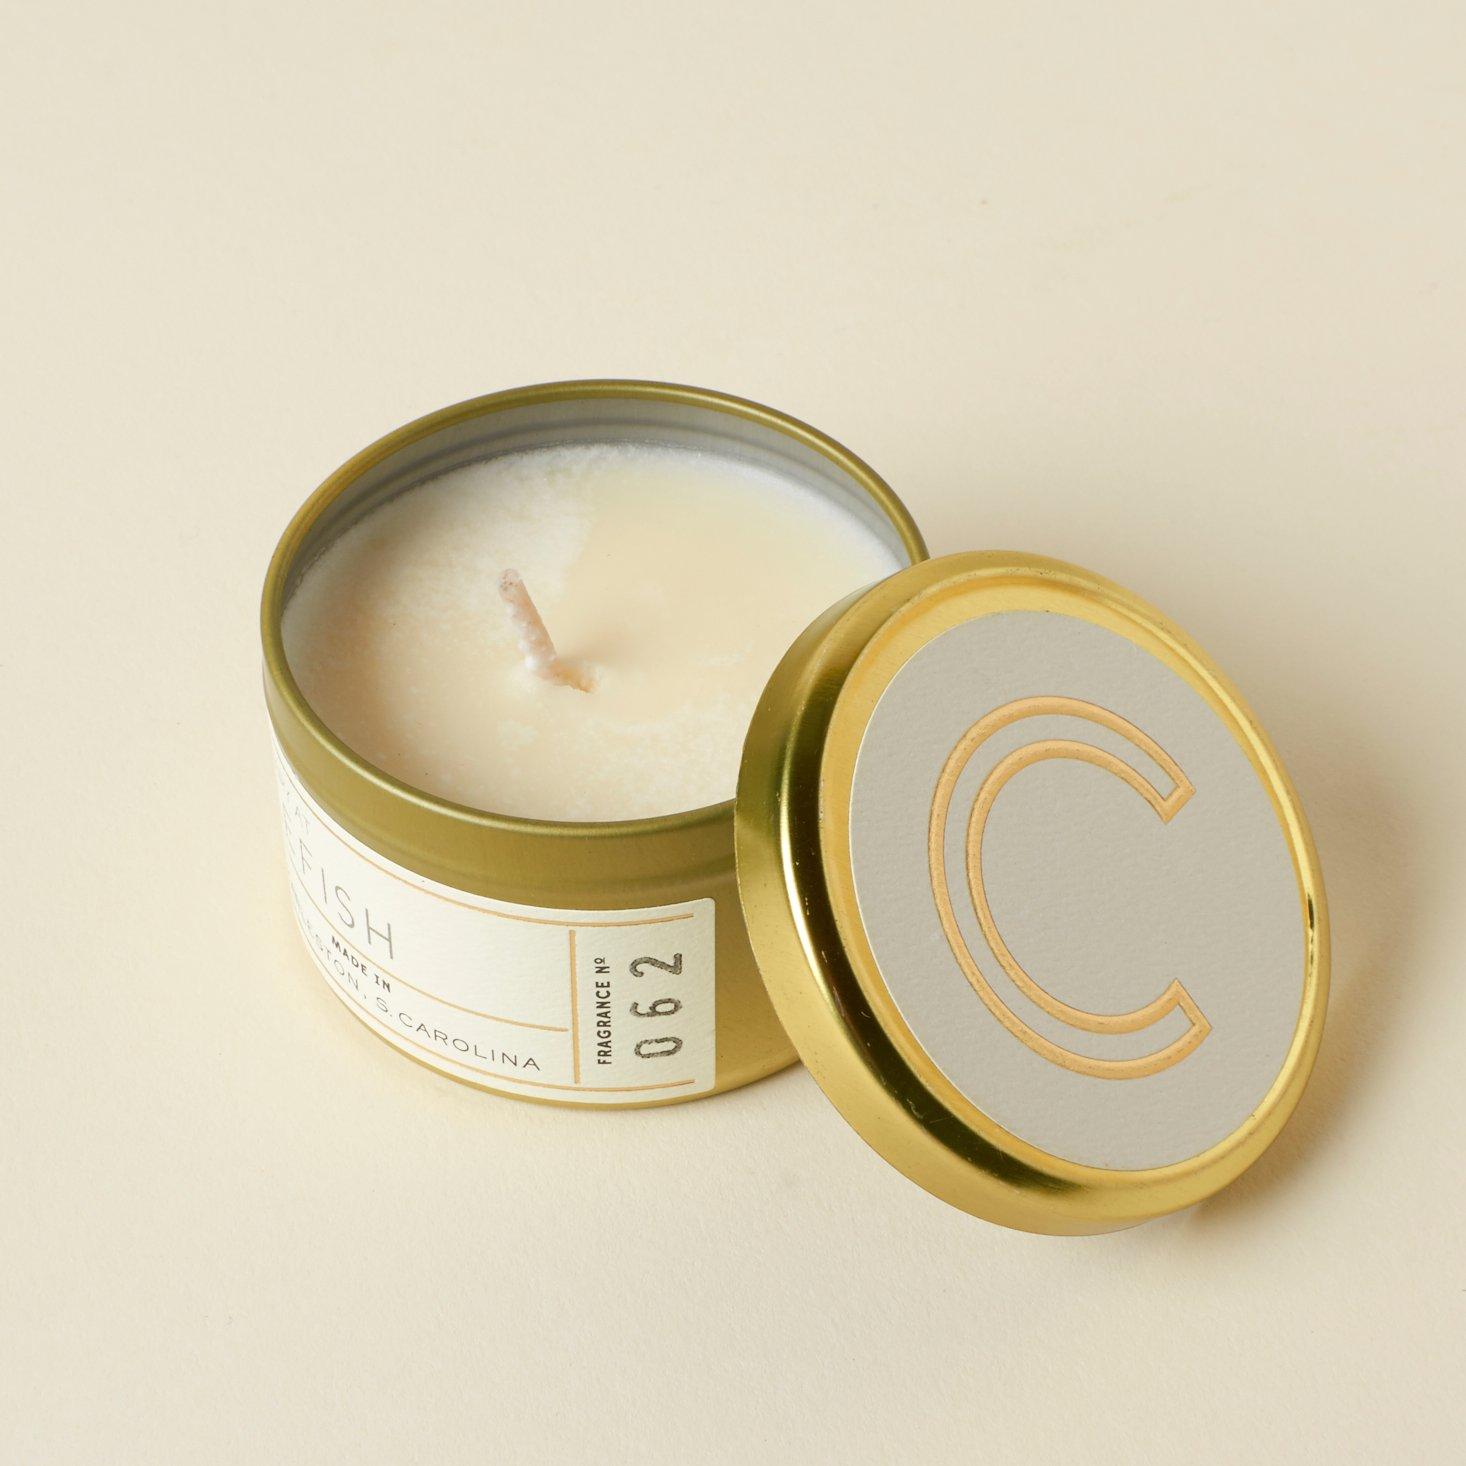 birchbox-good-as-gold-limited-edition-box-november-2016-0026